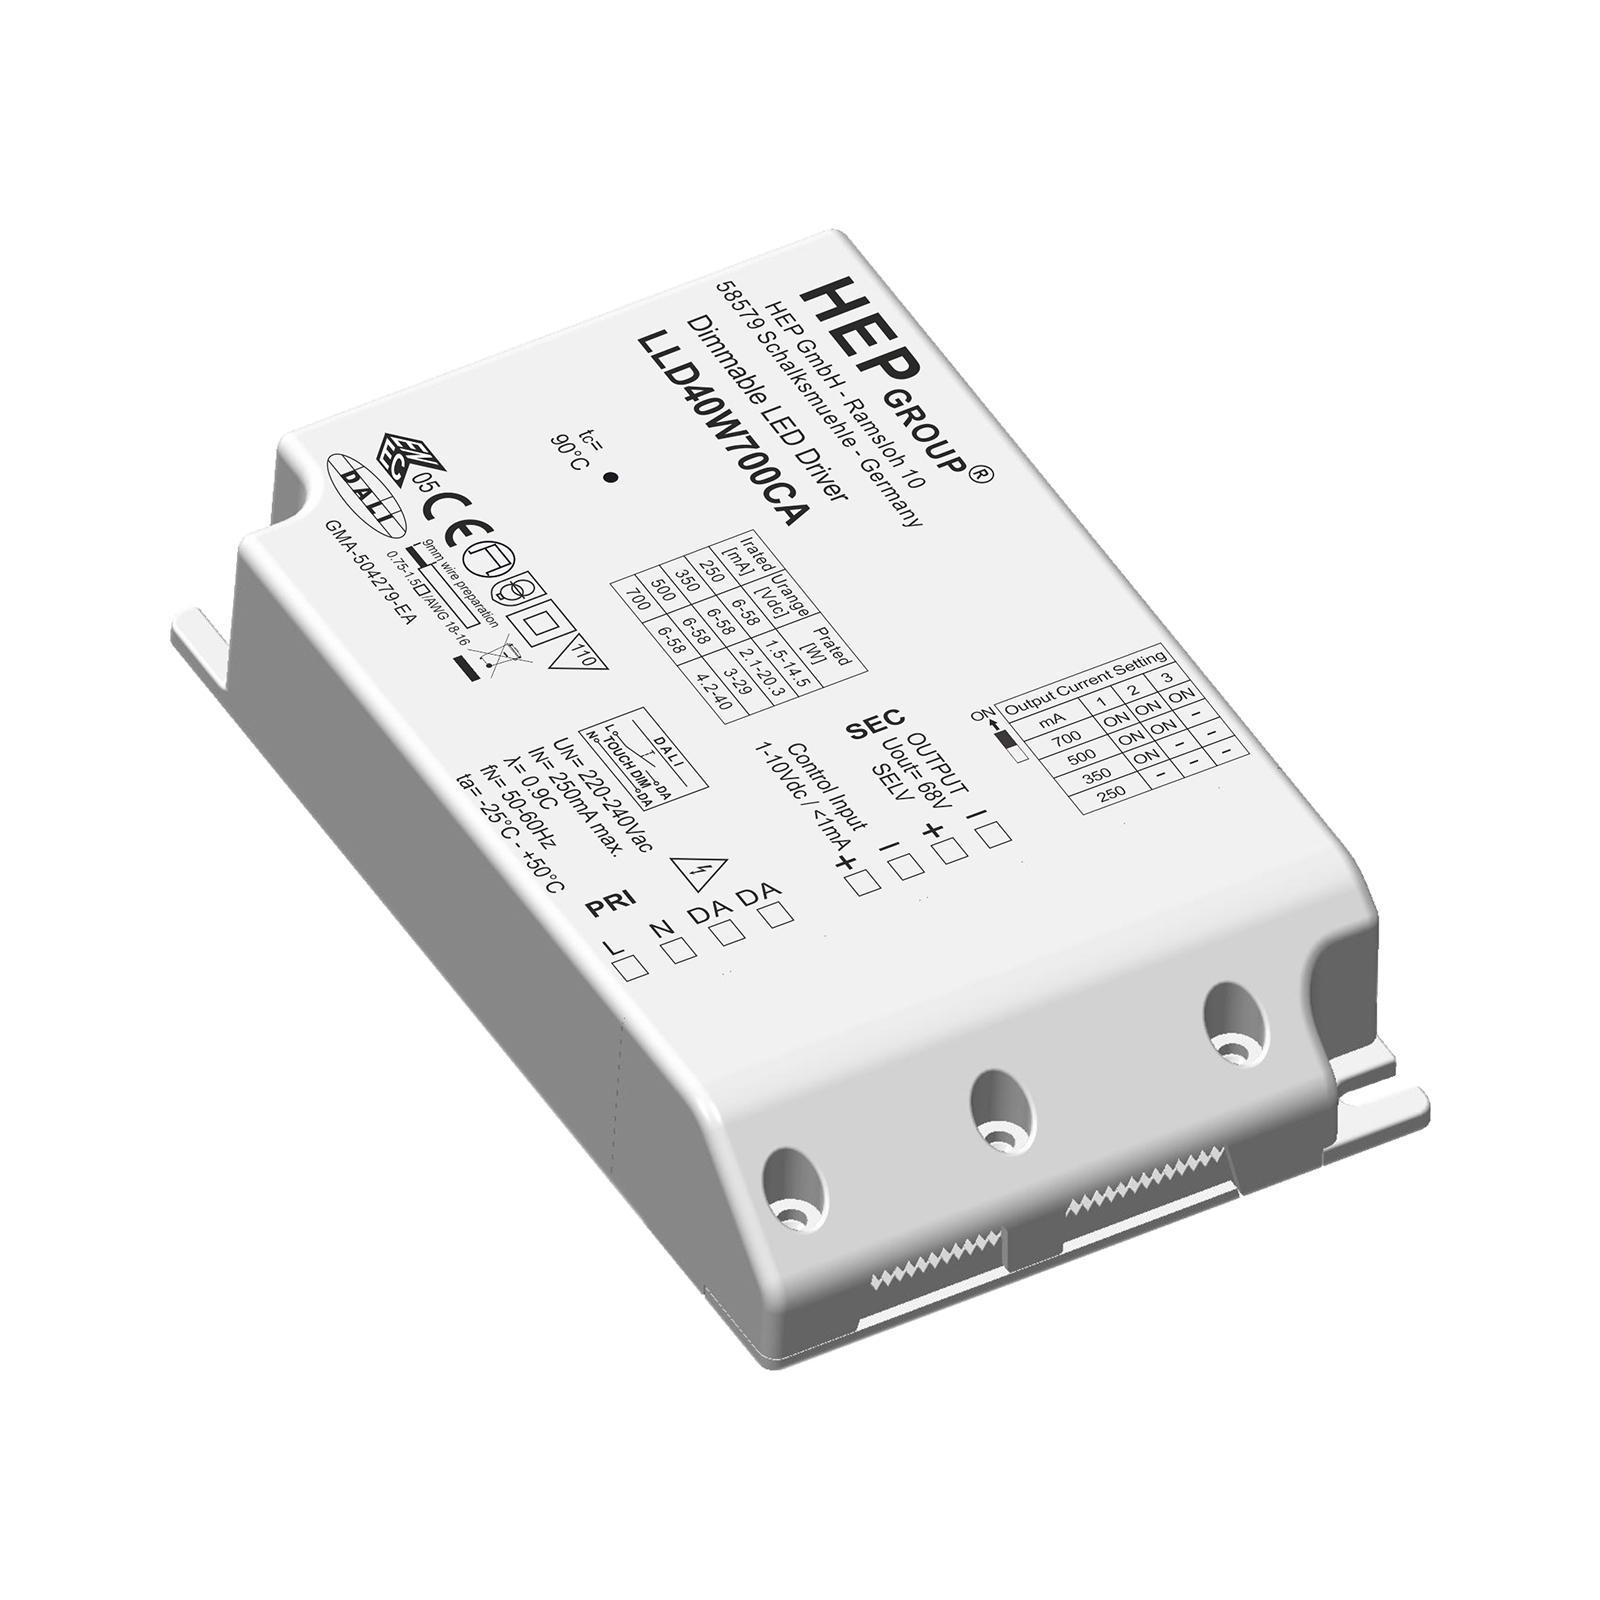 LED-driver LLD, 40 W, 700 mA, dimbar, CC